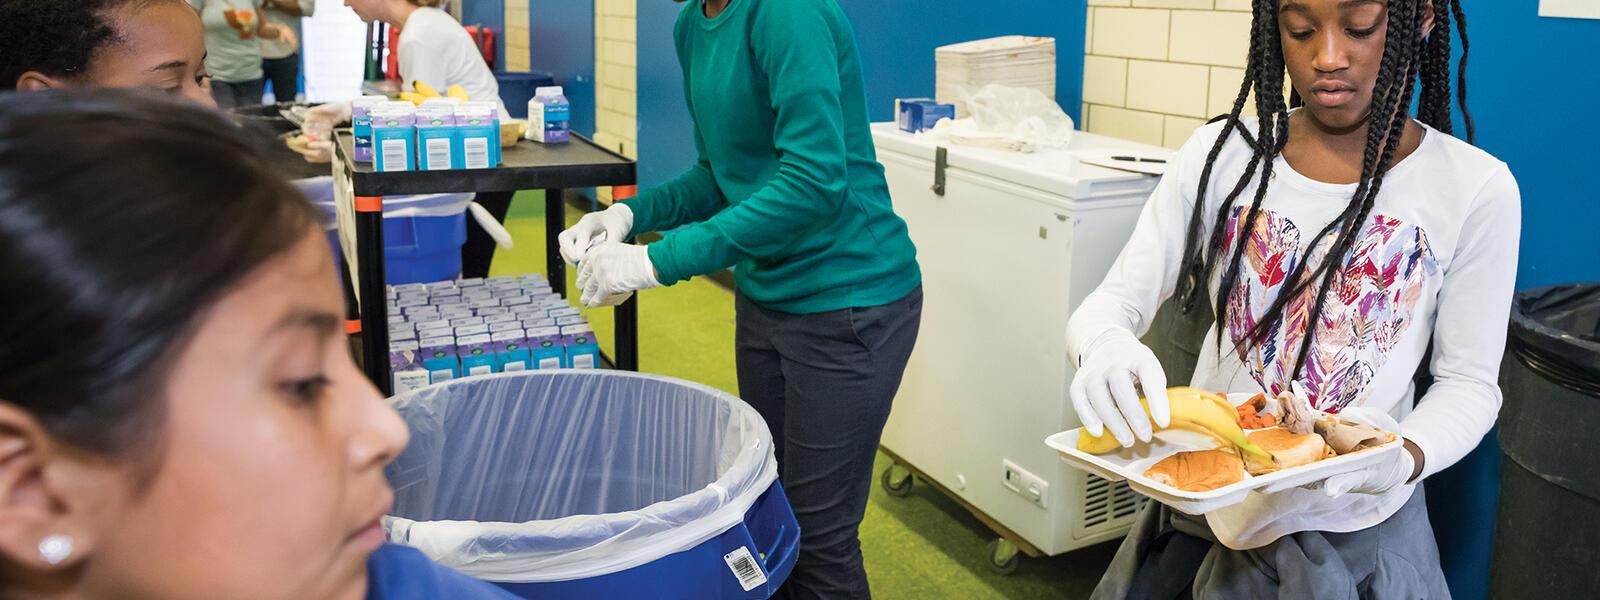 Four students participate in WWF's food waste education program at Seaton Public Elementary School, Washington, DC